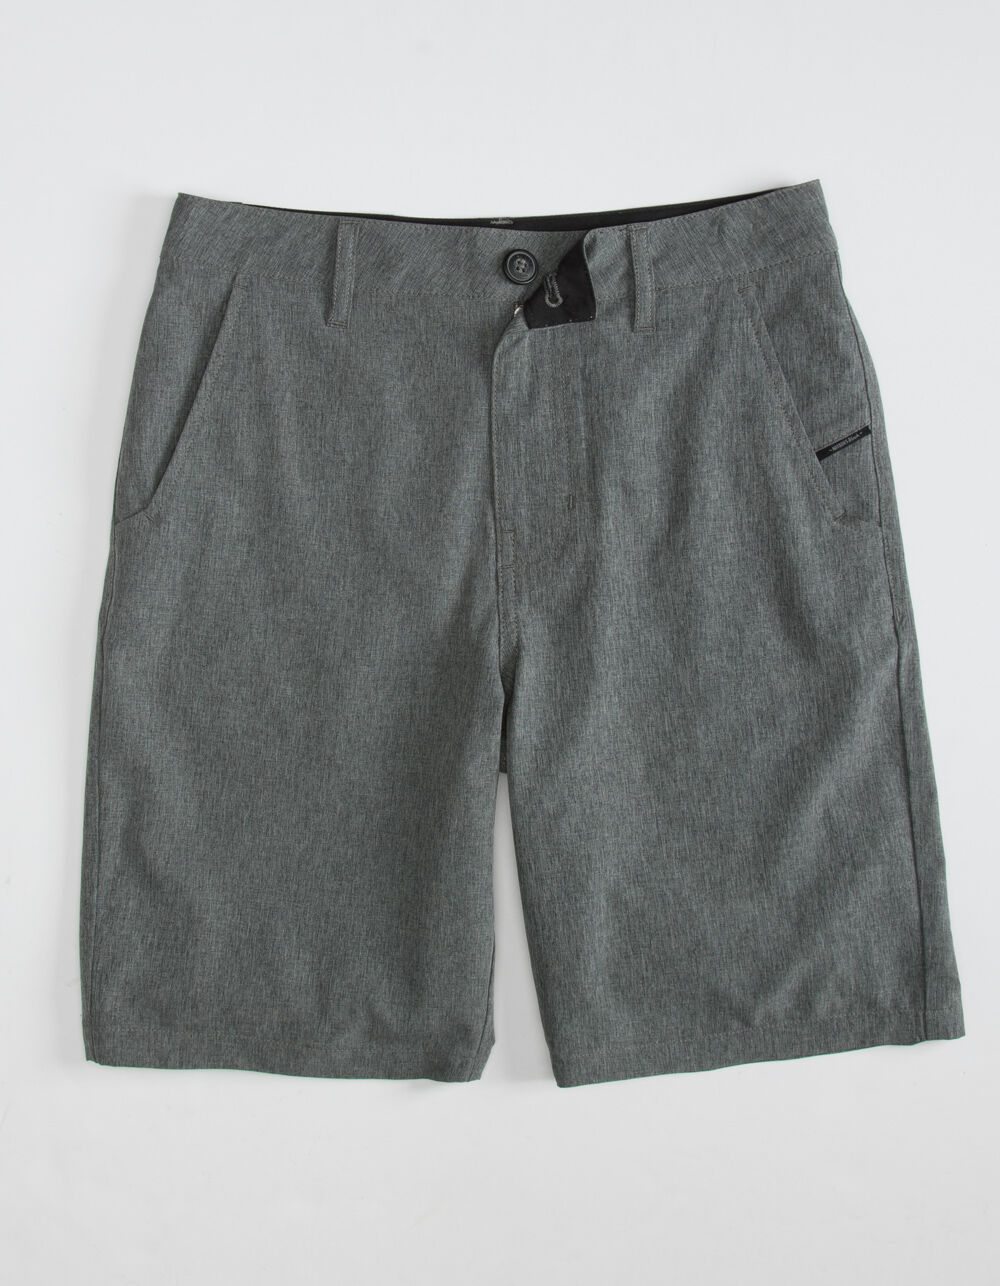 NITROUS BLACK Format Boys Charcoal Hybrid Shorts